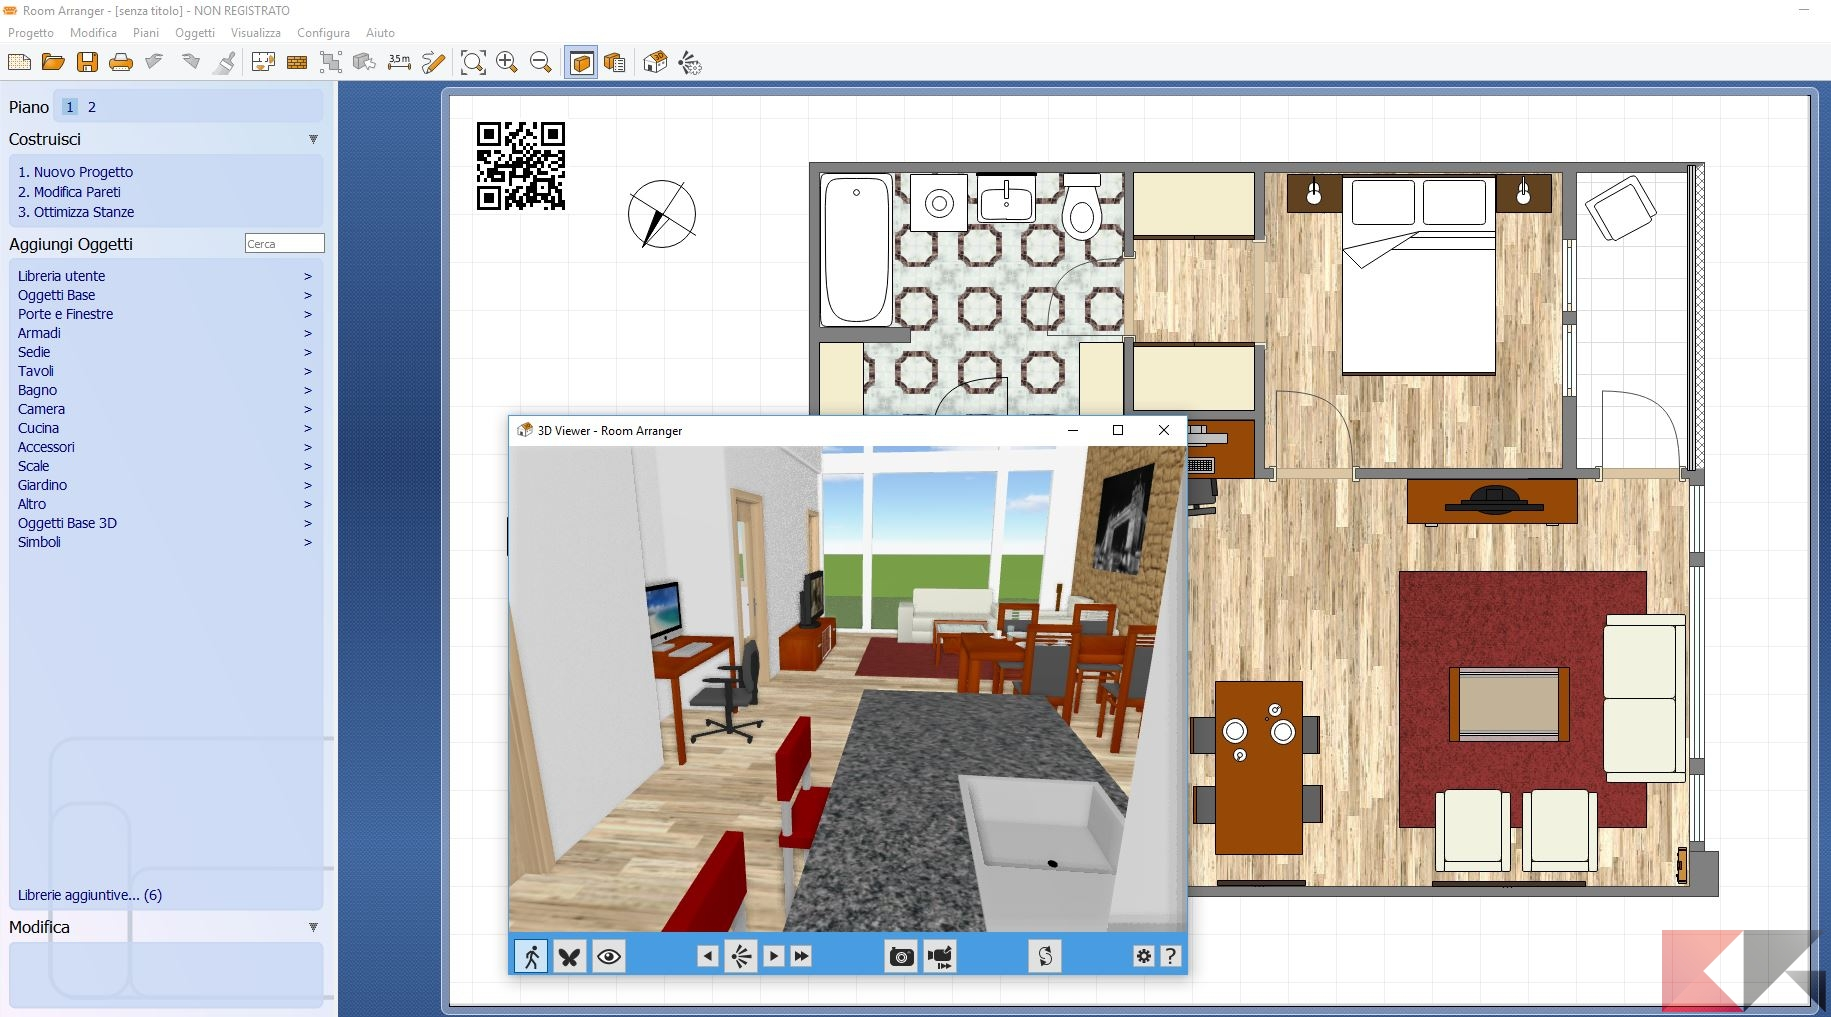 Programma arredare casa gratis for Programma per disegnare cucine gratis